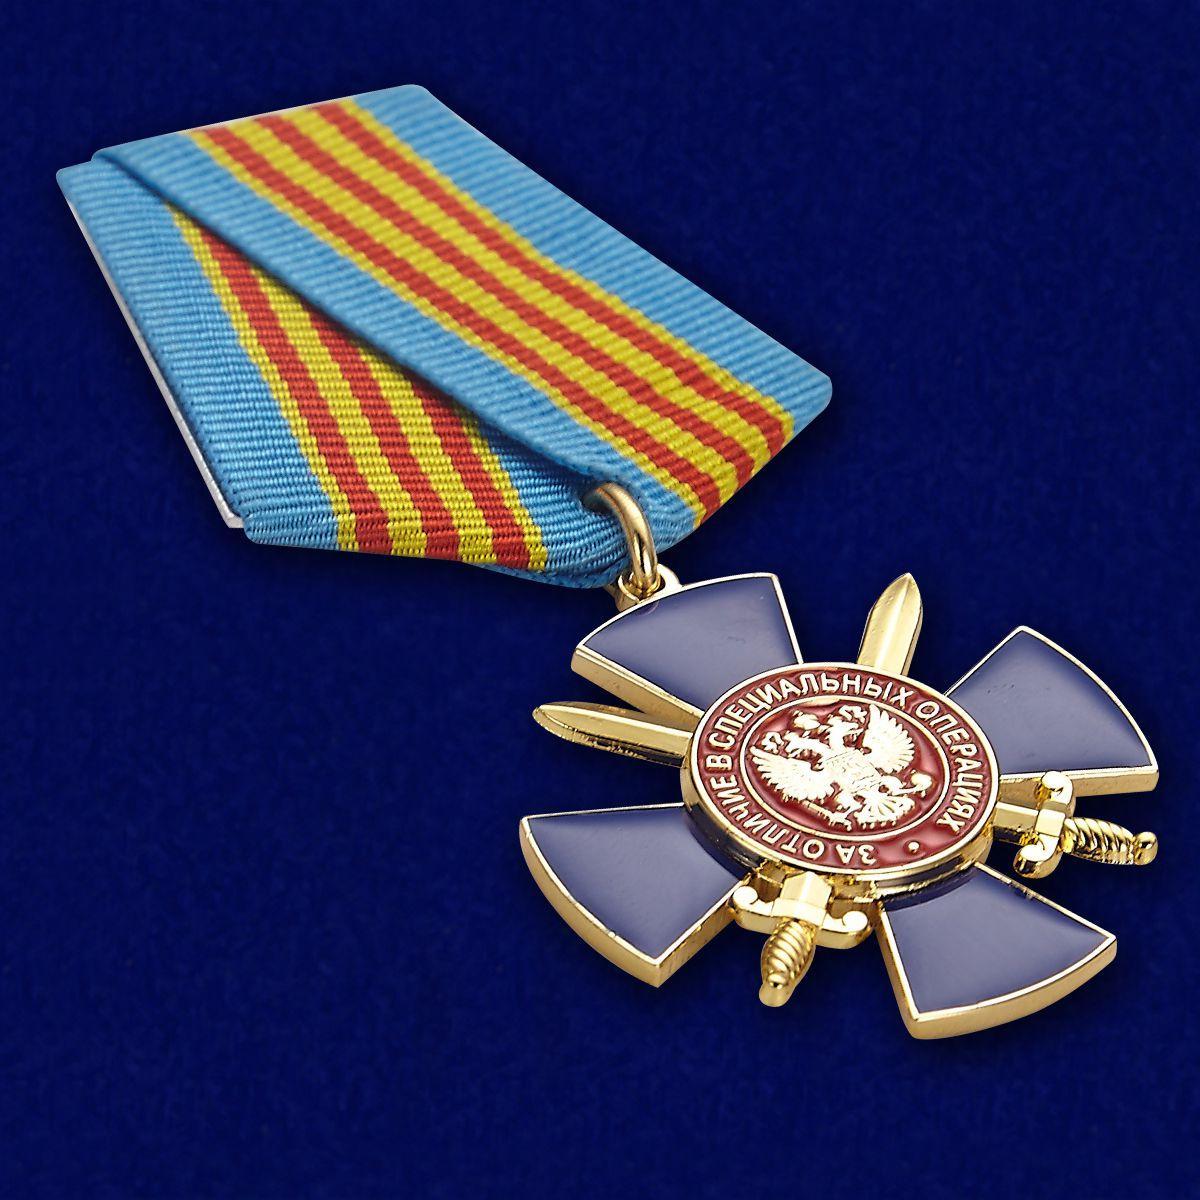 Недорого заказать медали ФСБ онлайн